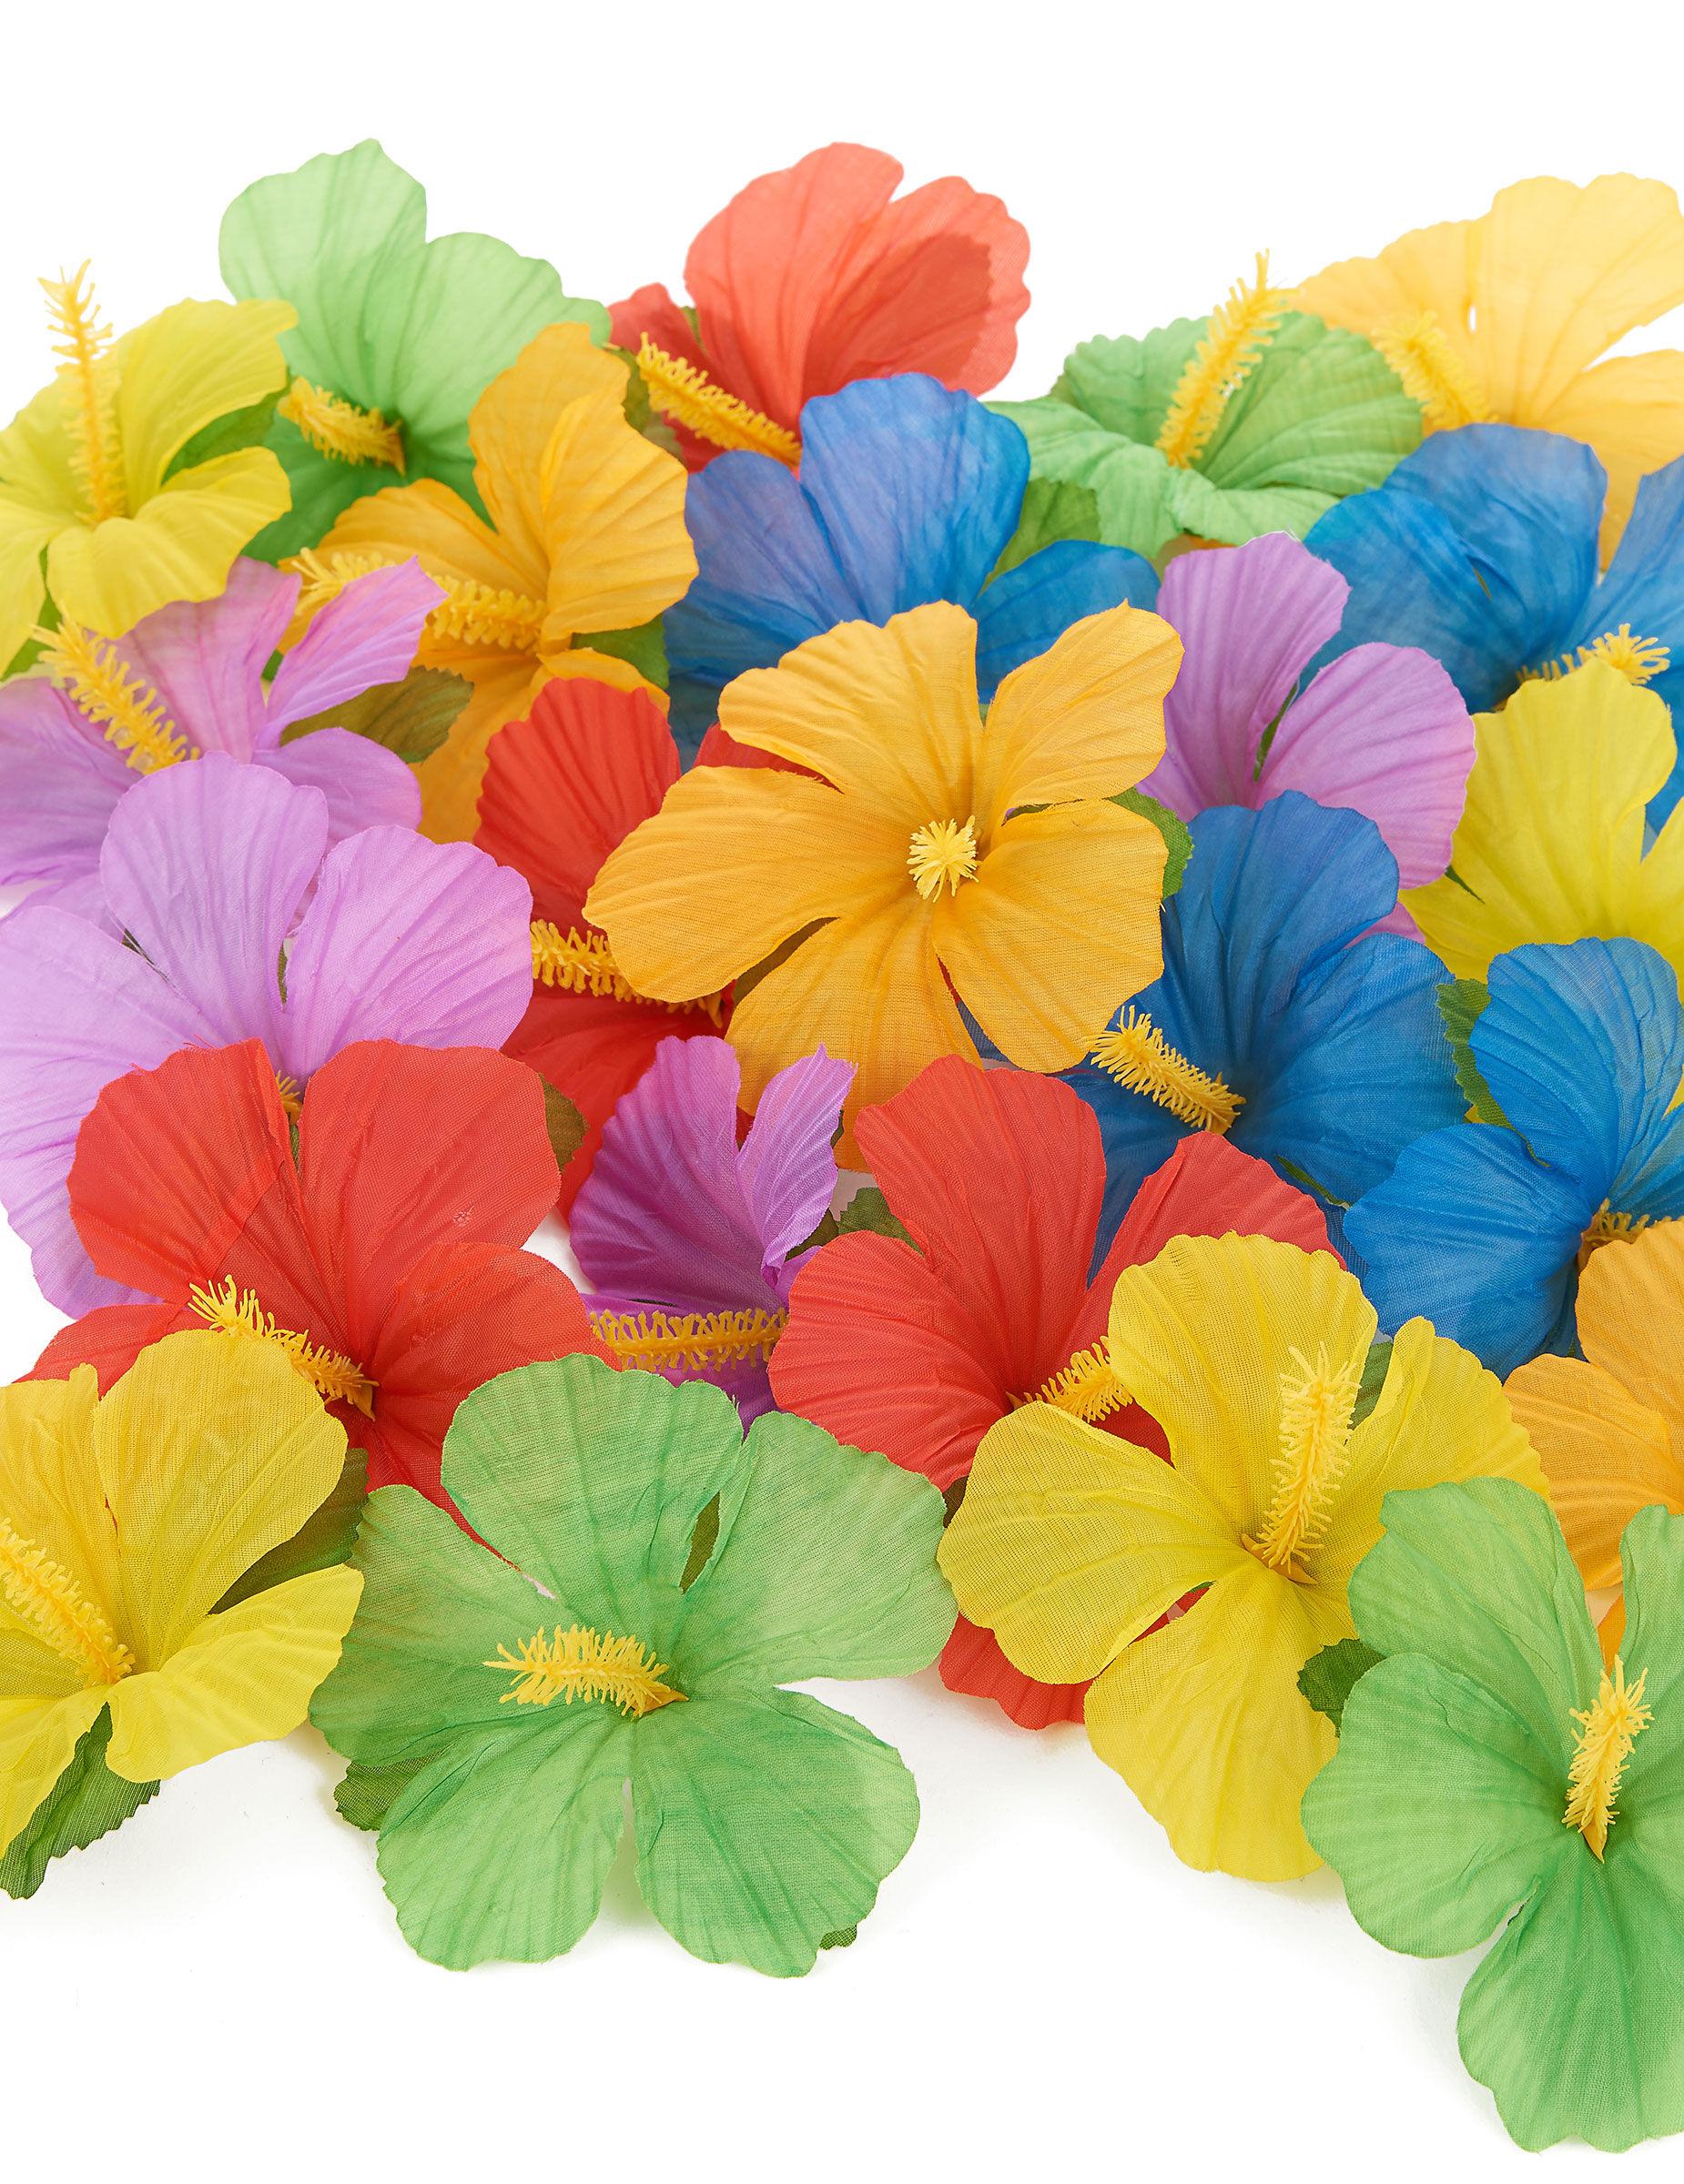 VegaooParty 24 fleurs hawaïennes